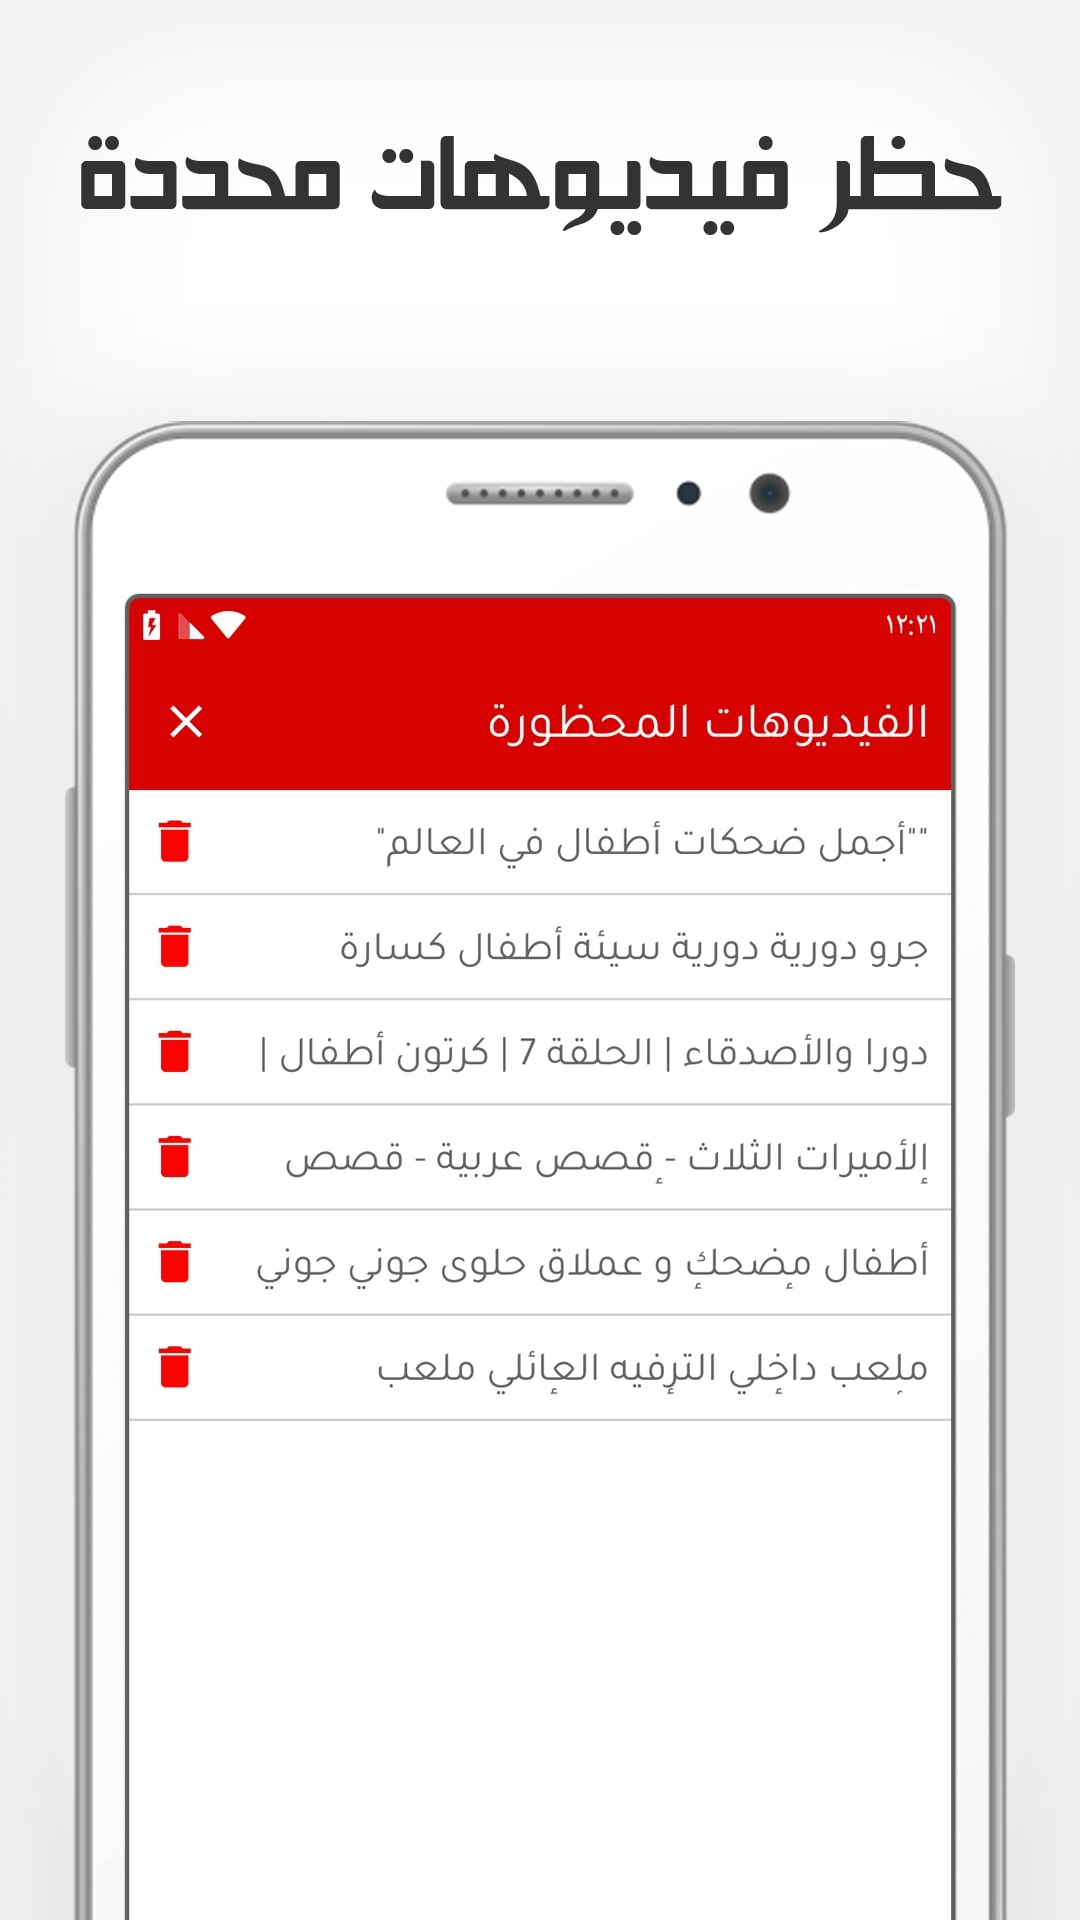 aa3_apps.com_app_sc_kidstube_ar_5.jpg